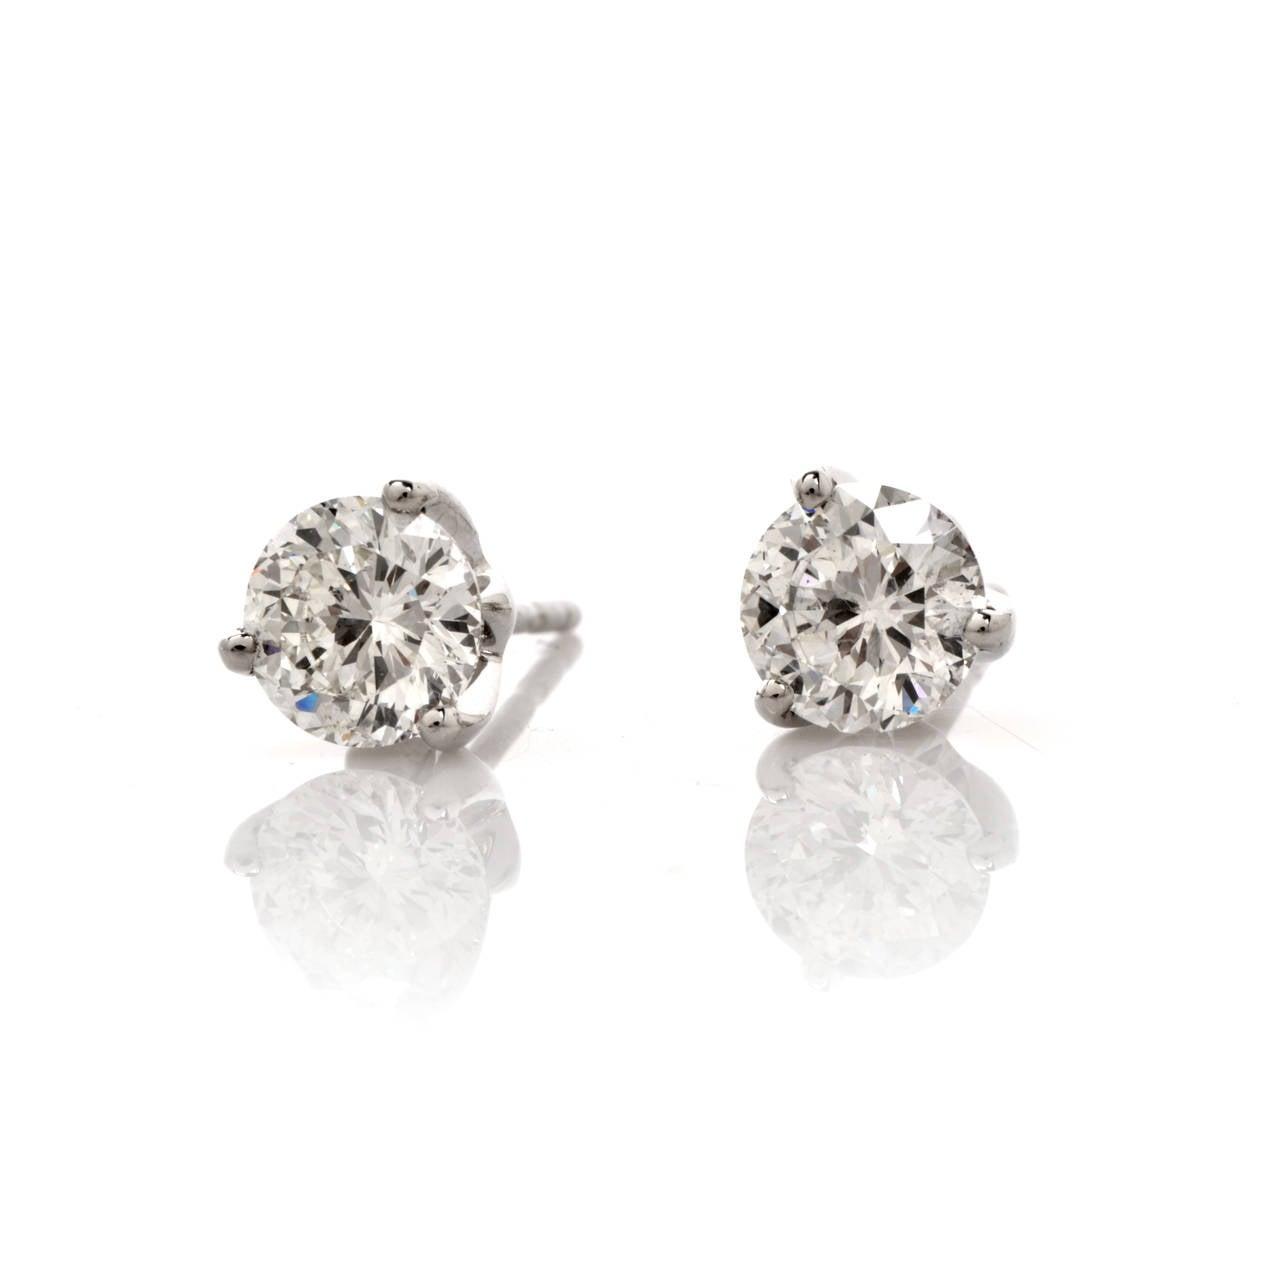 Roberto Coin Diamond Gold Stud Earrings at 1stdibs